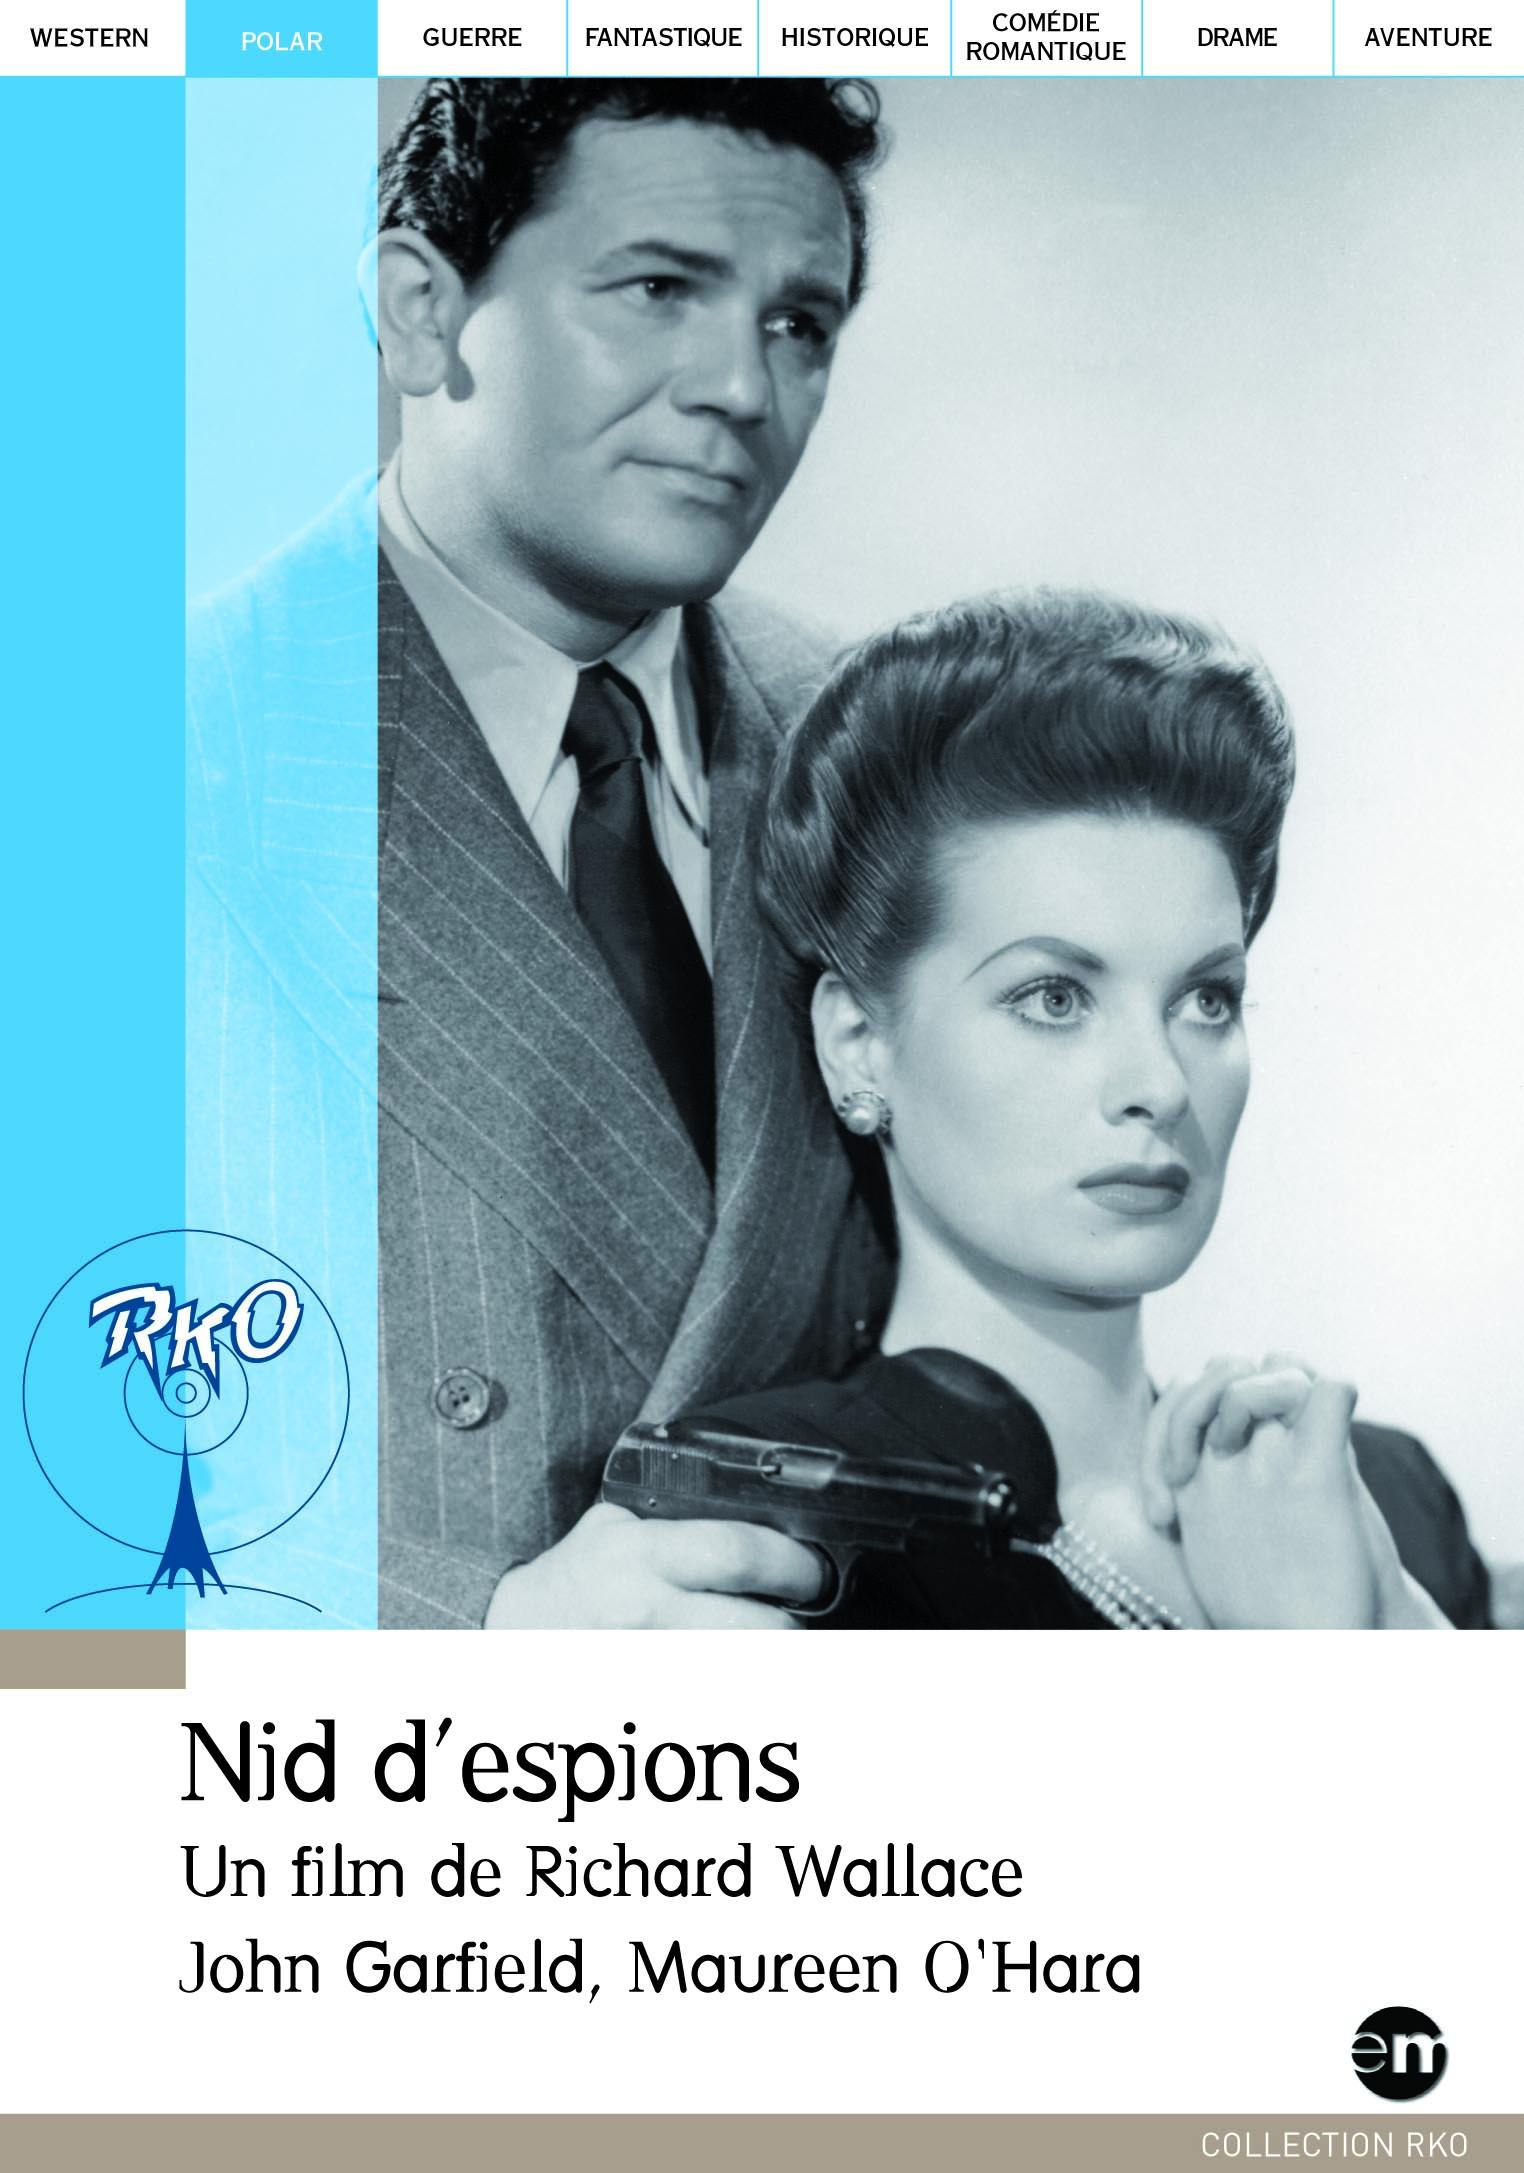 Nid d'espions - dvd  collection rko pocket